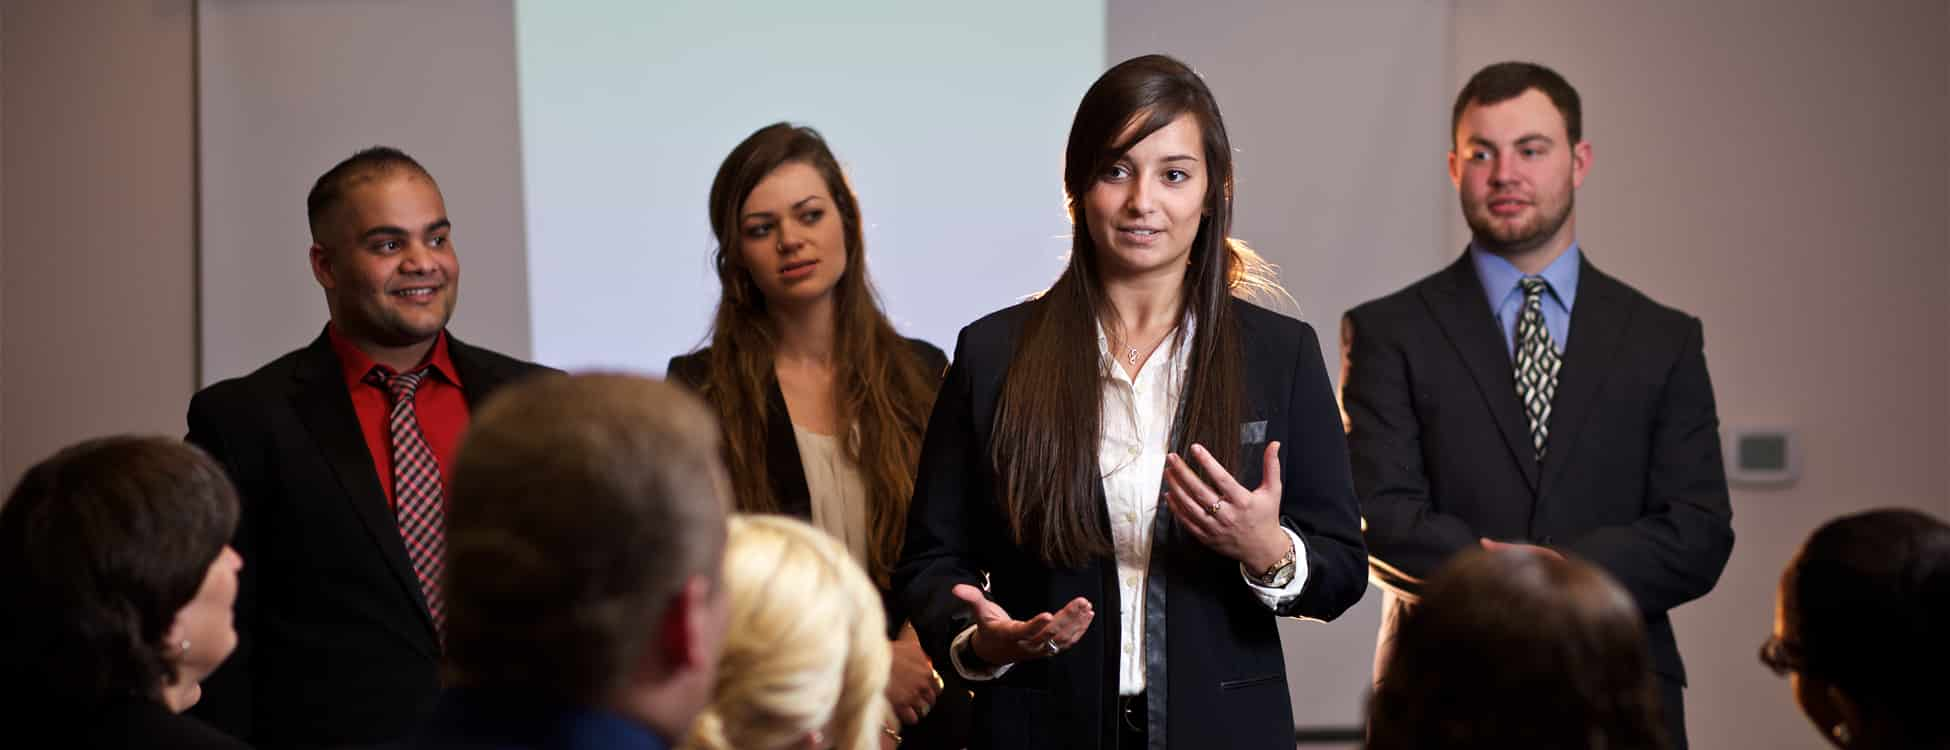 Students present their entrepreneurship finals, diversity